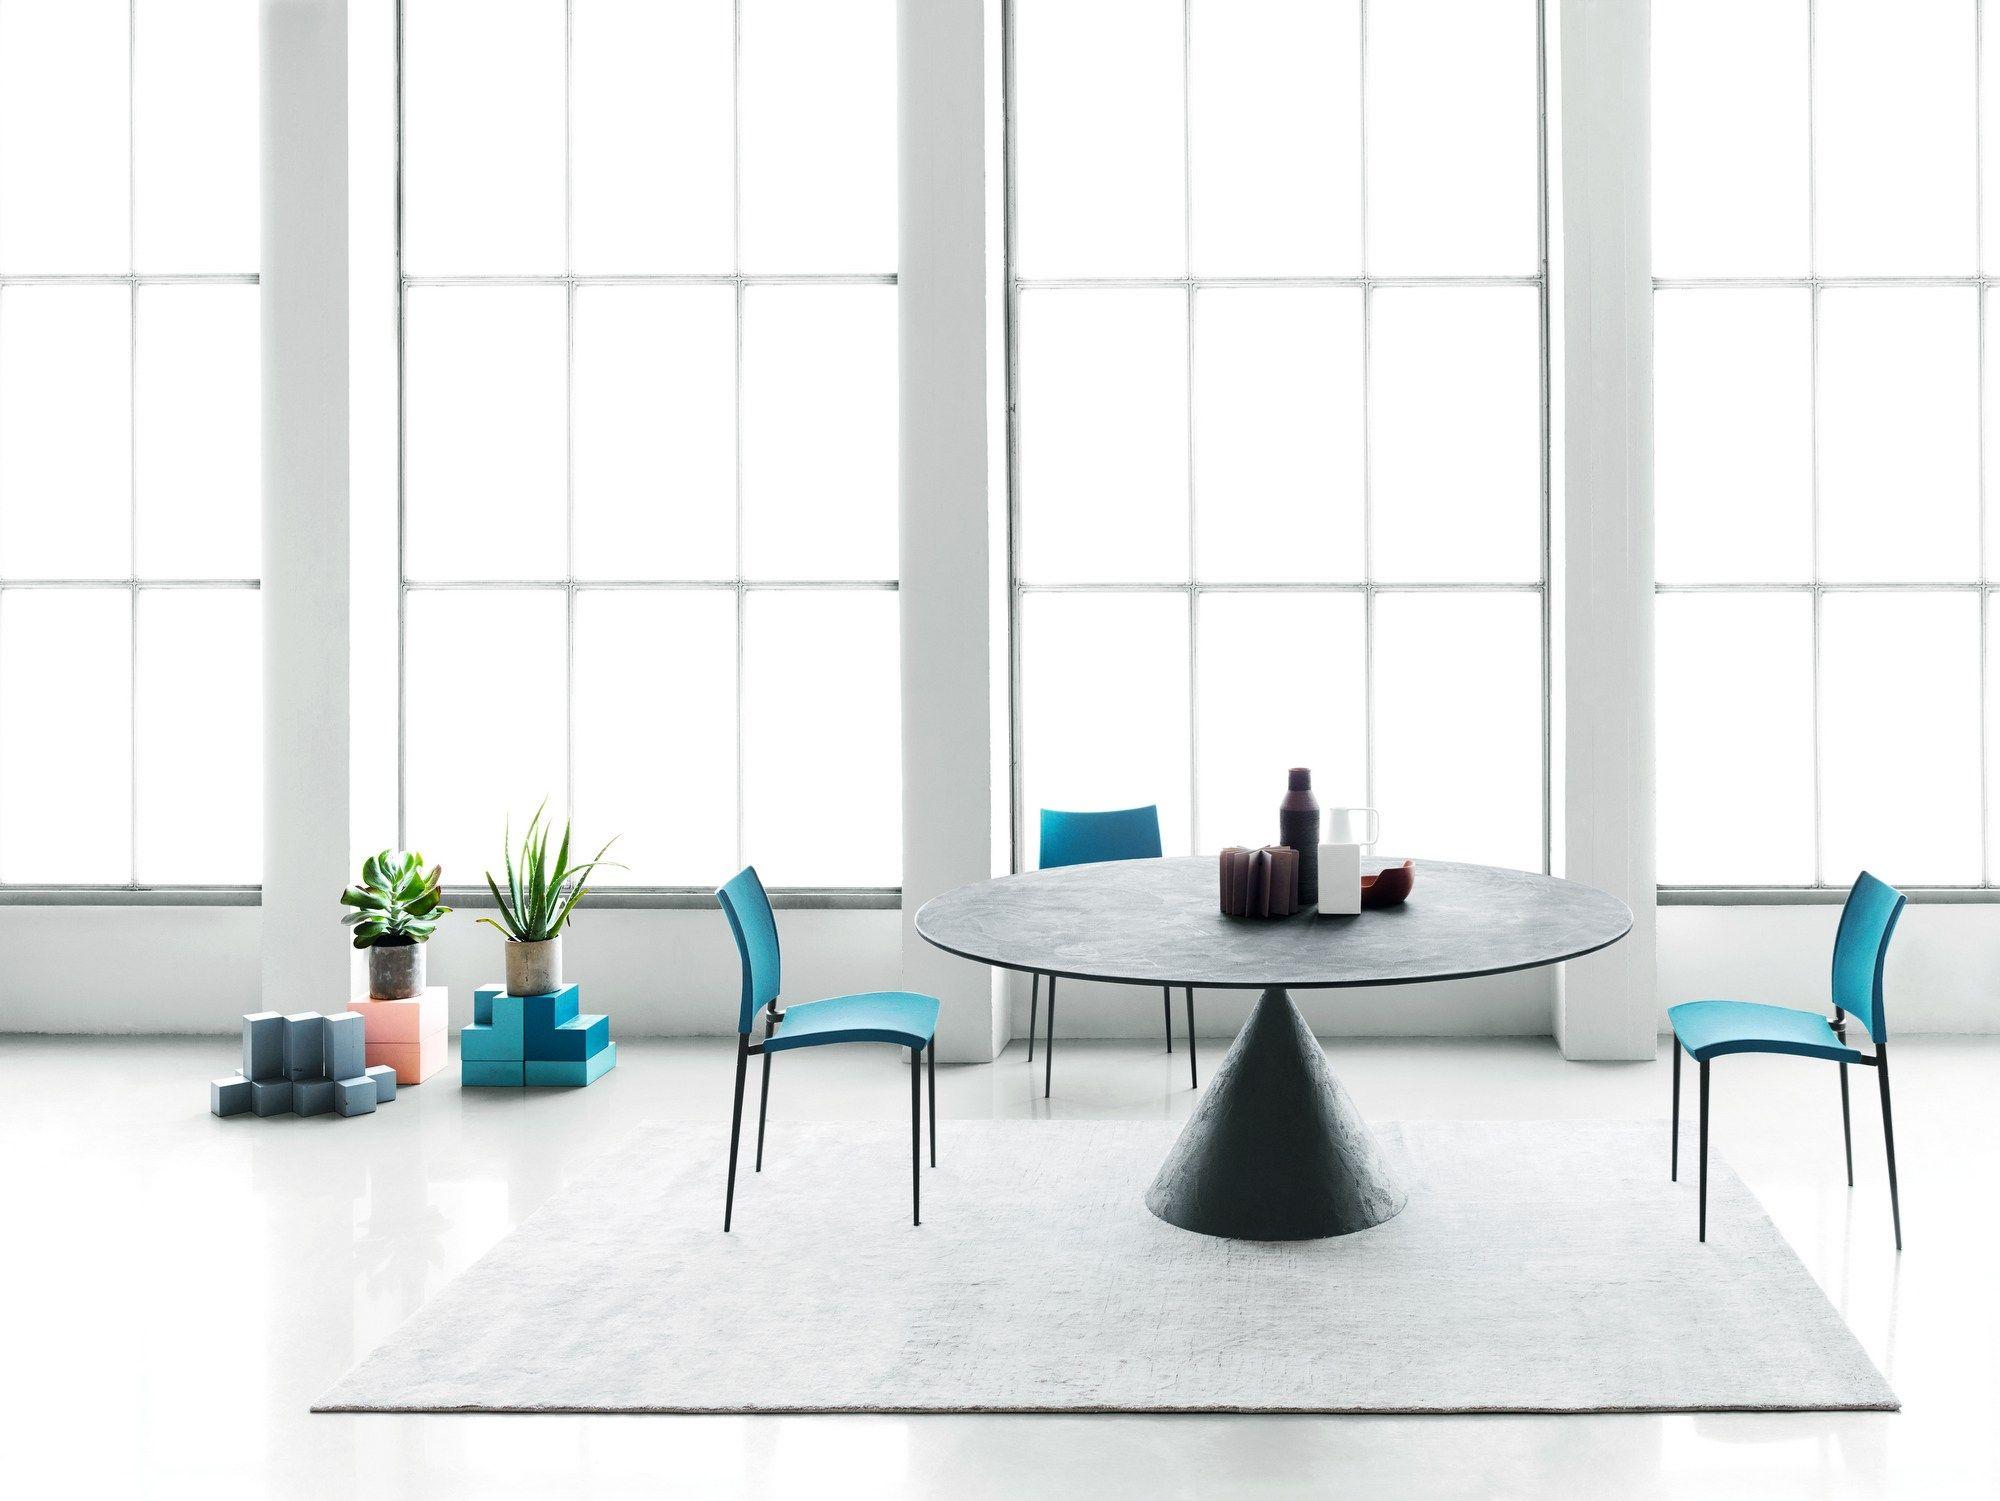 Clay Stone Tabledesalto Design Marc Krusin  Casa Piazza Best Designer Kitchen Tables Review